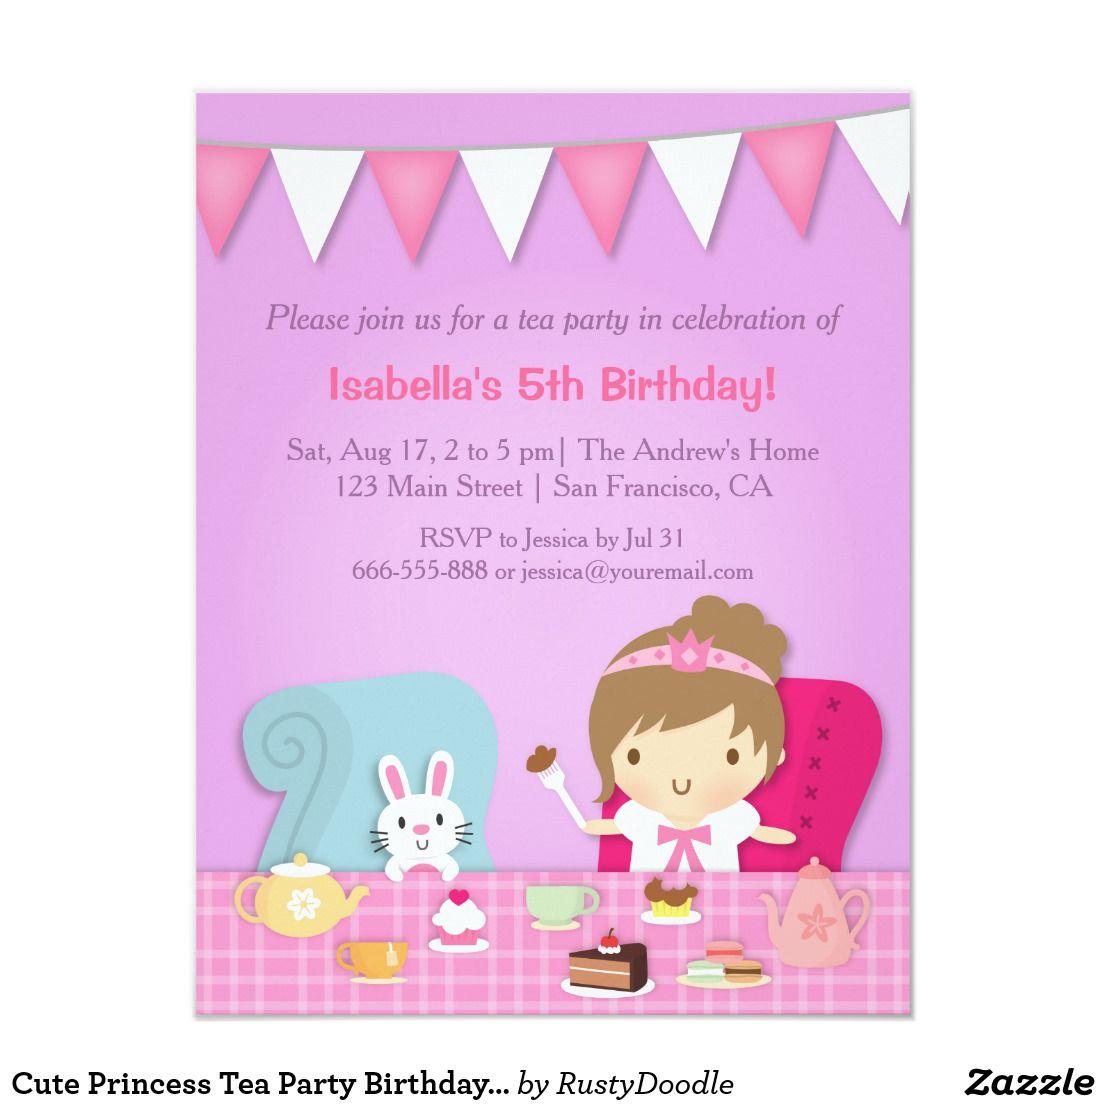 Cute Princess Tea Party Birthday Invitations Invite your party ...